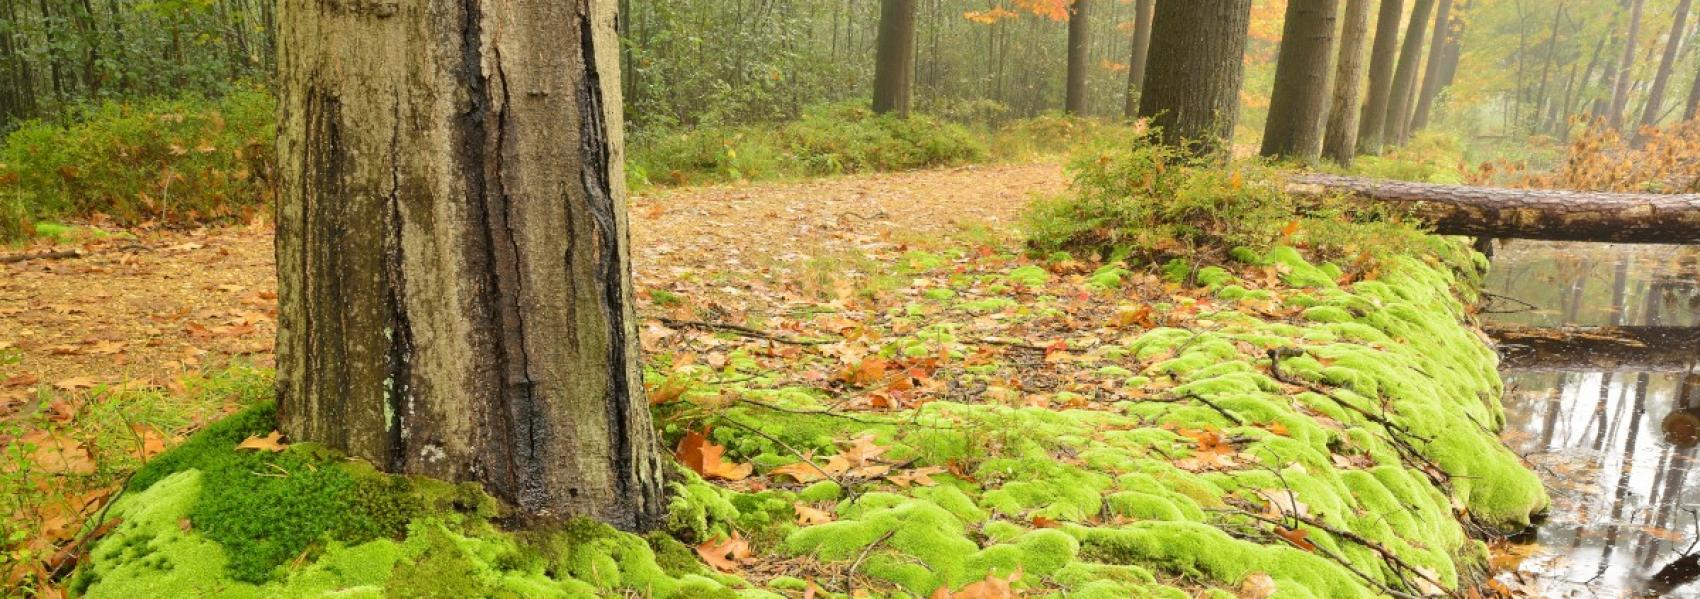 mos op de grond rond de bomen